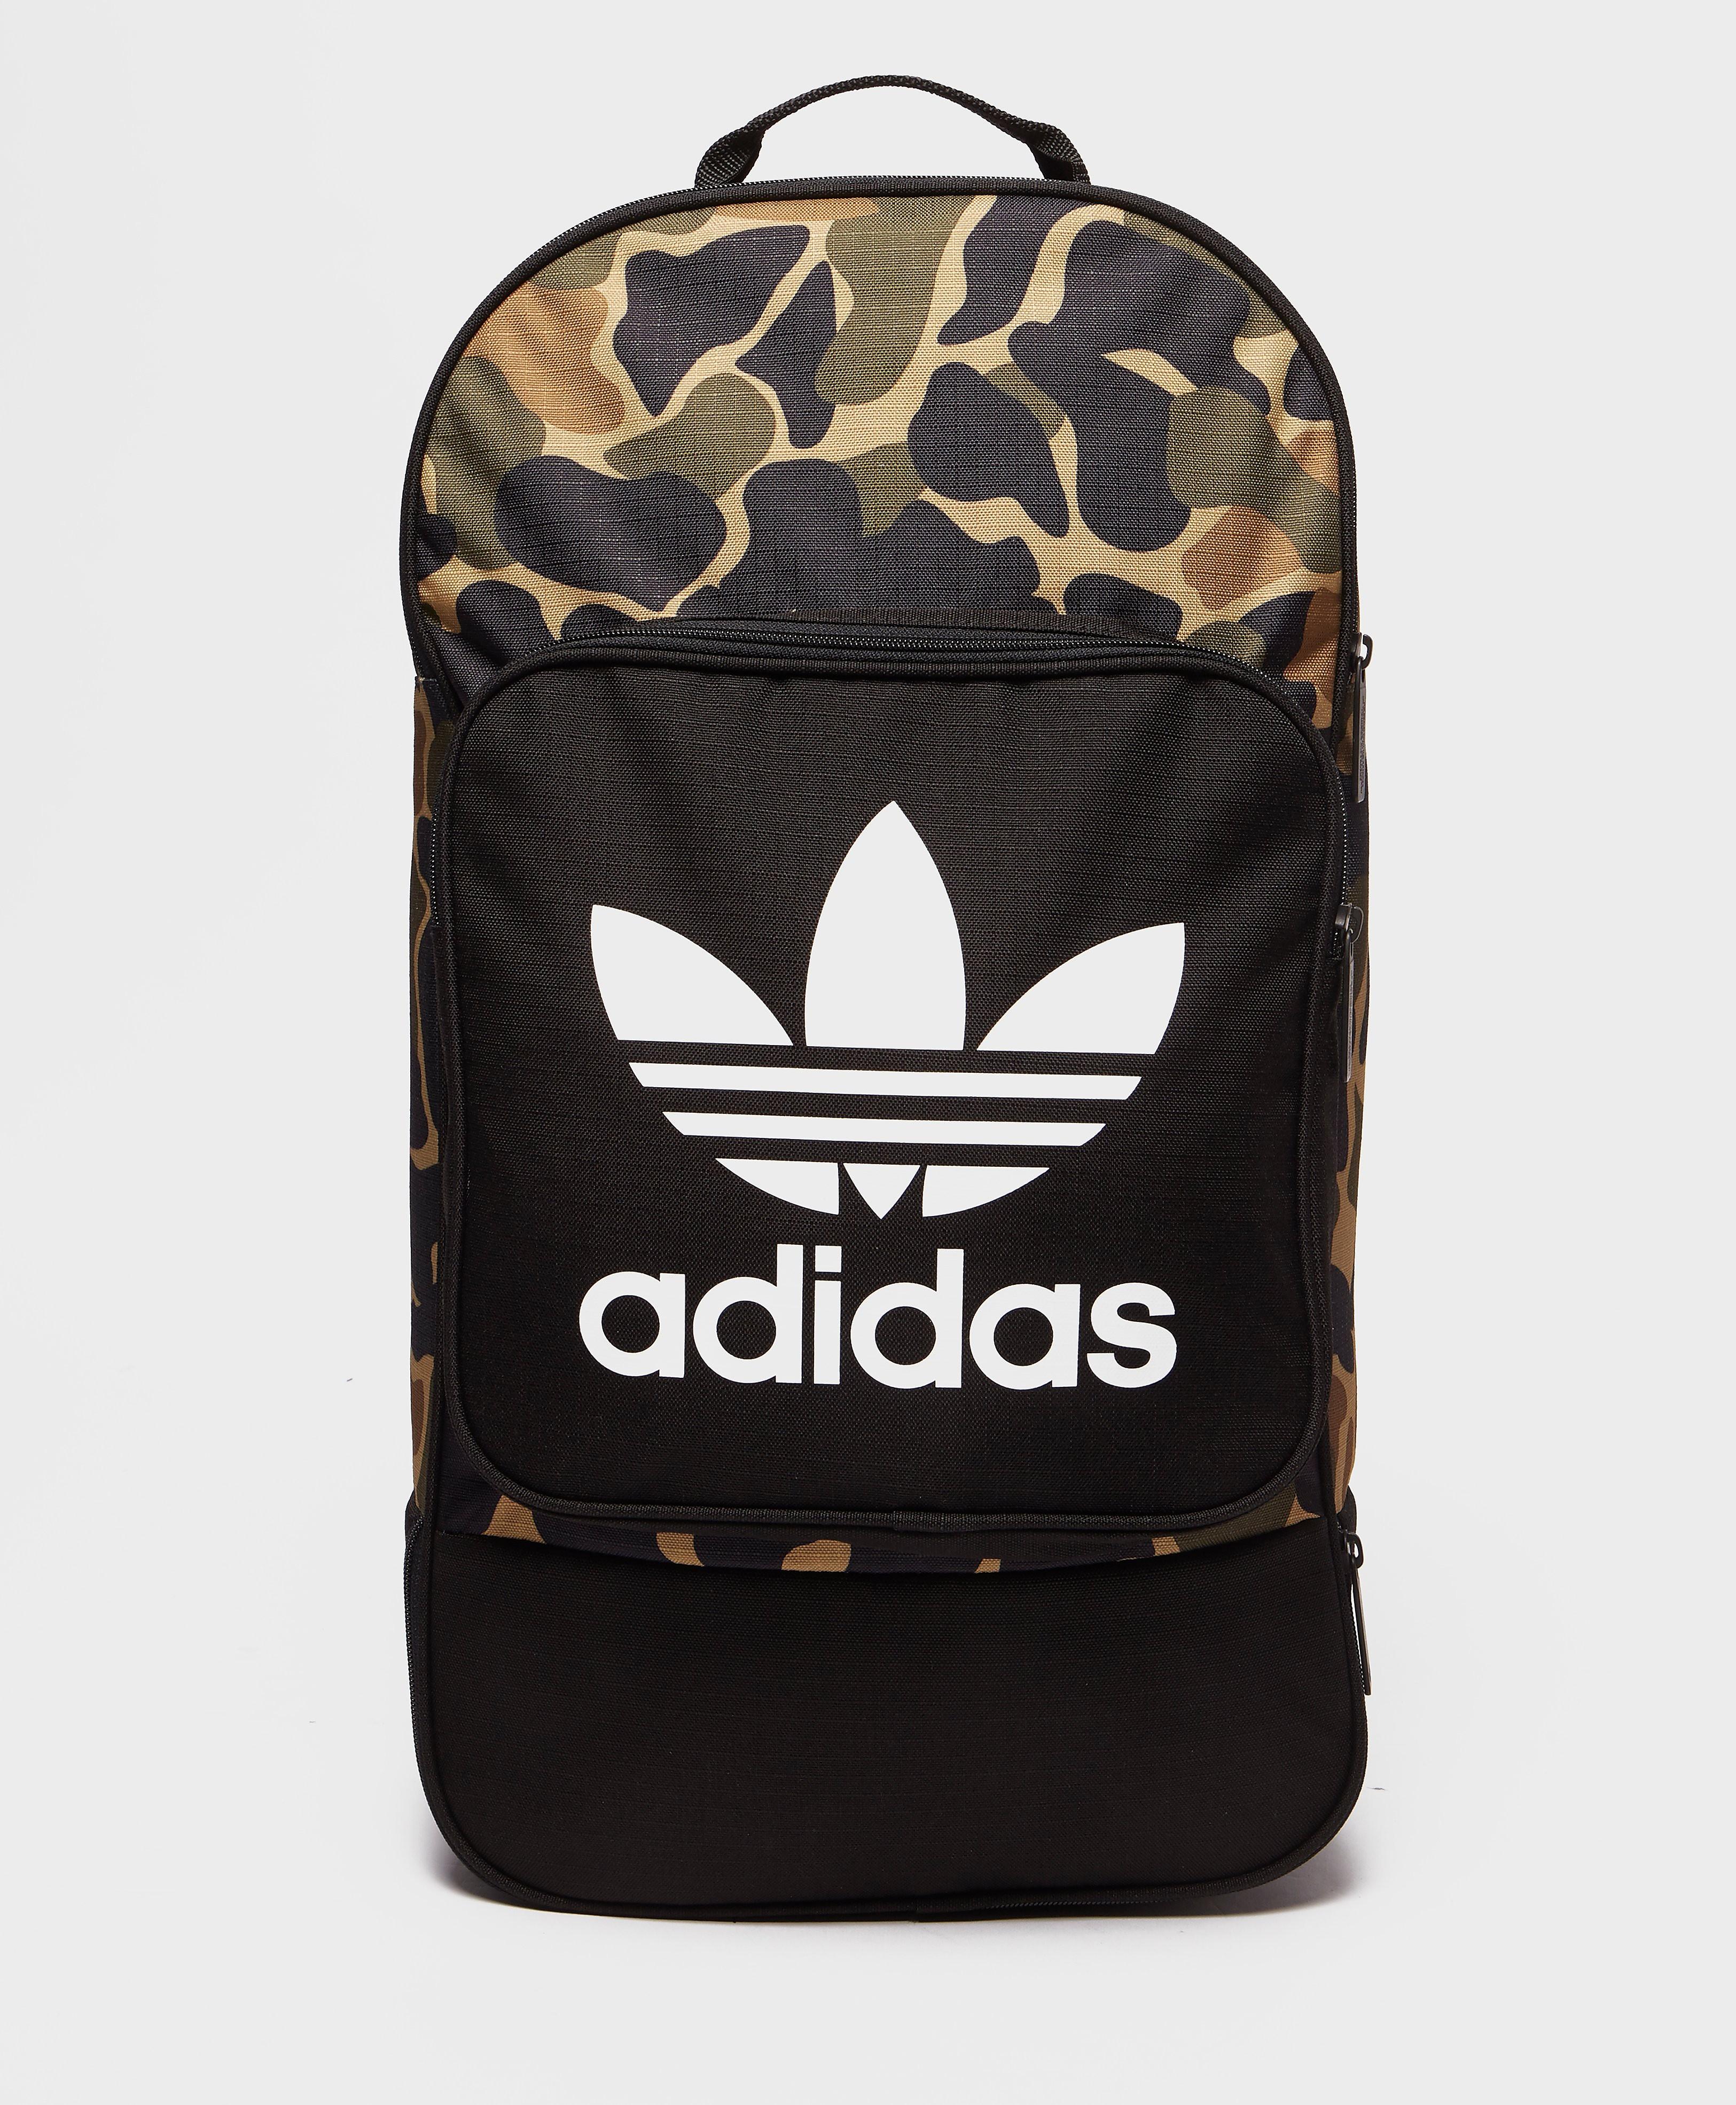 adidas Originals Street Backpack